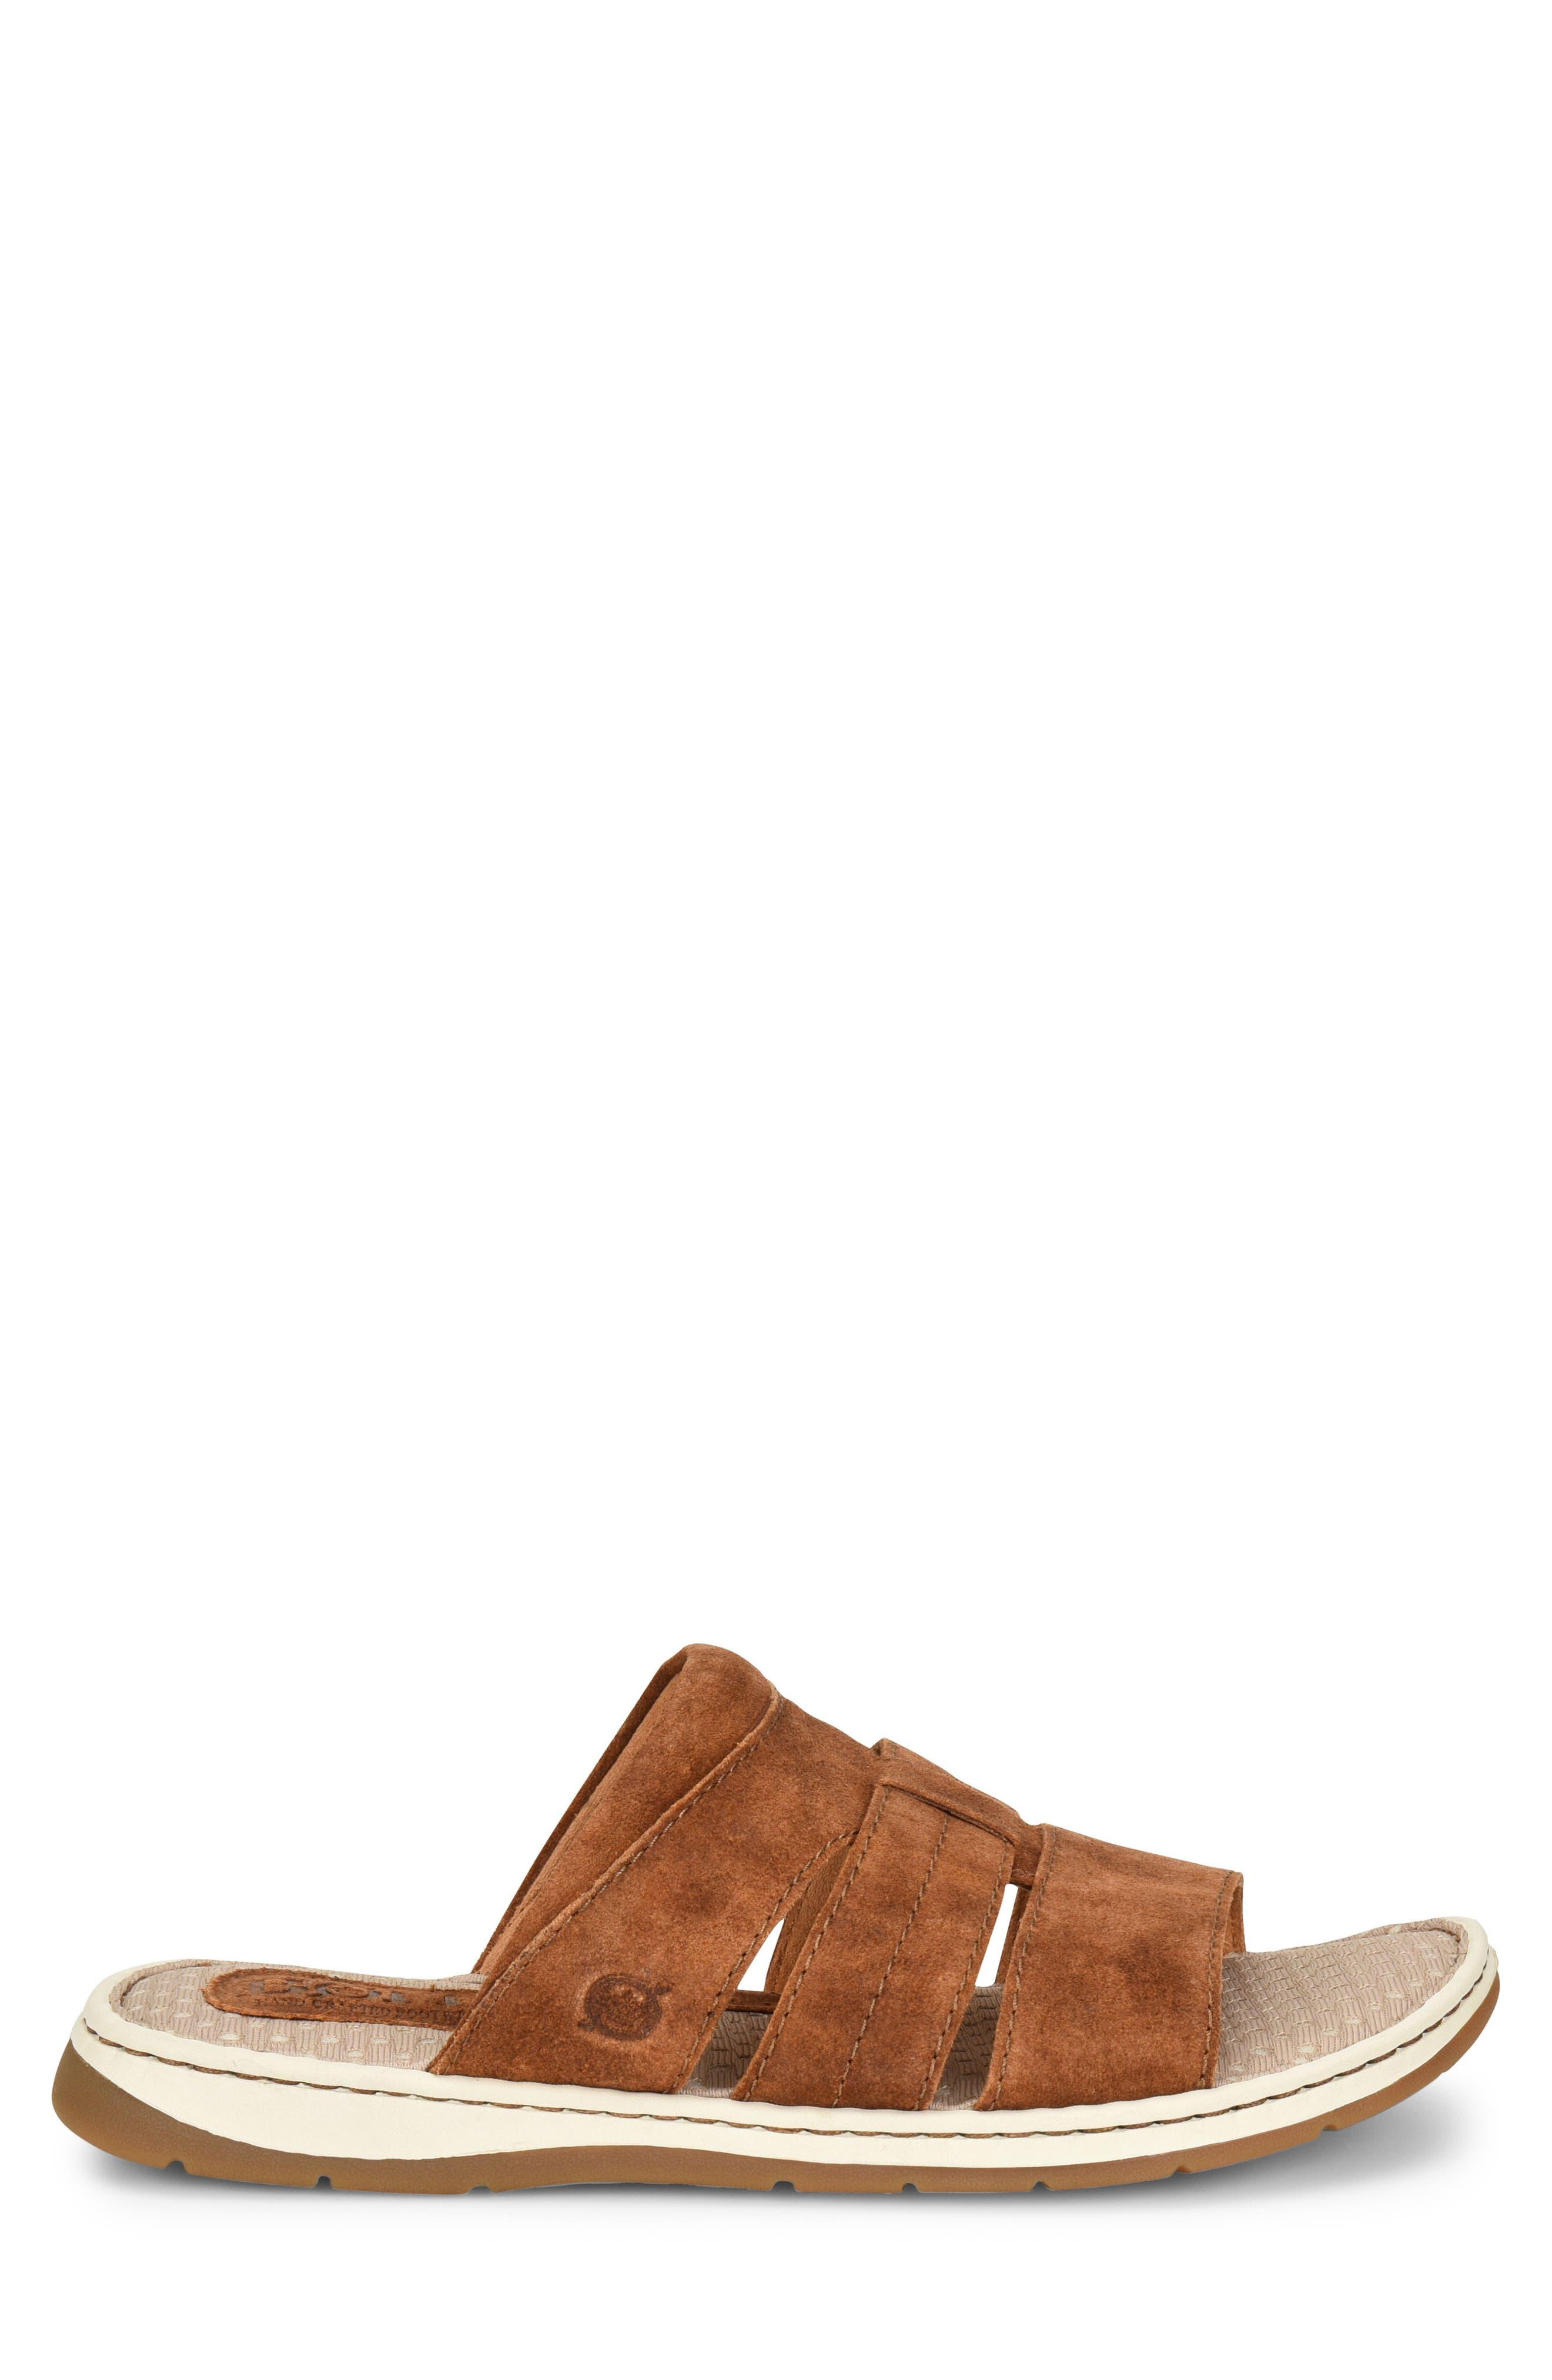 Sail Slide Sandal,                             Alternate thumbnail 3, color,                             Rust Leather